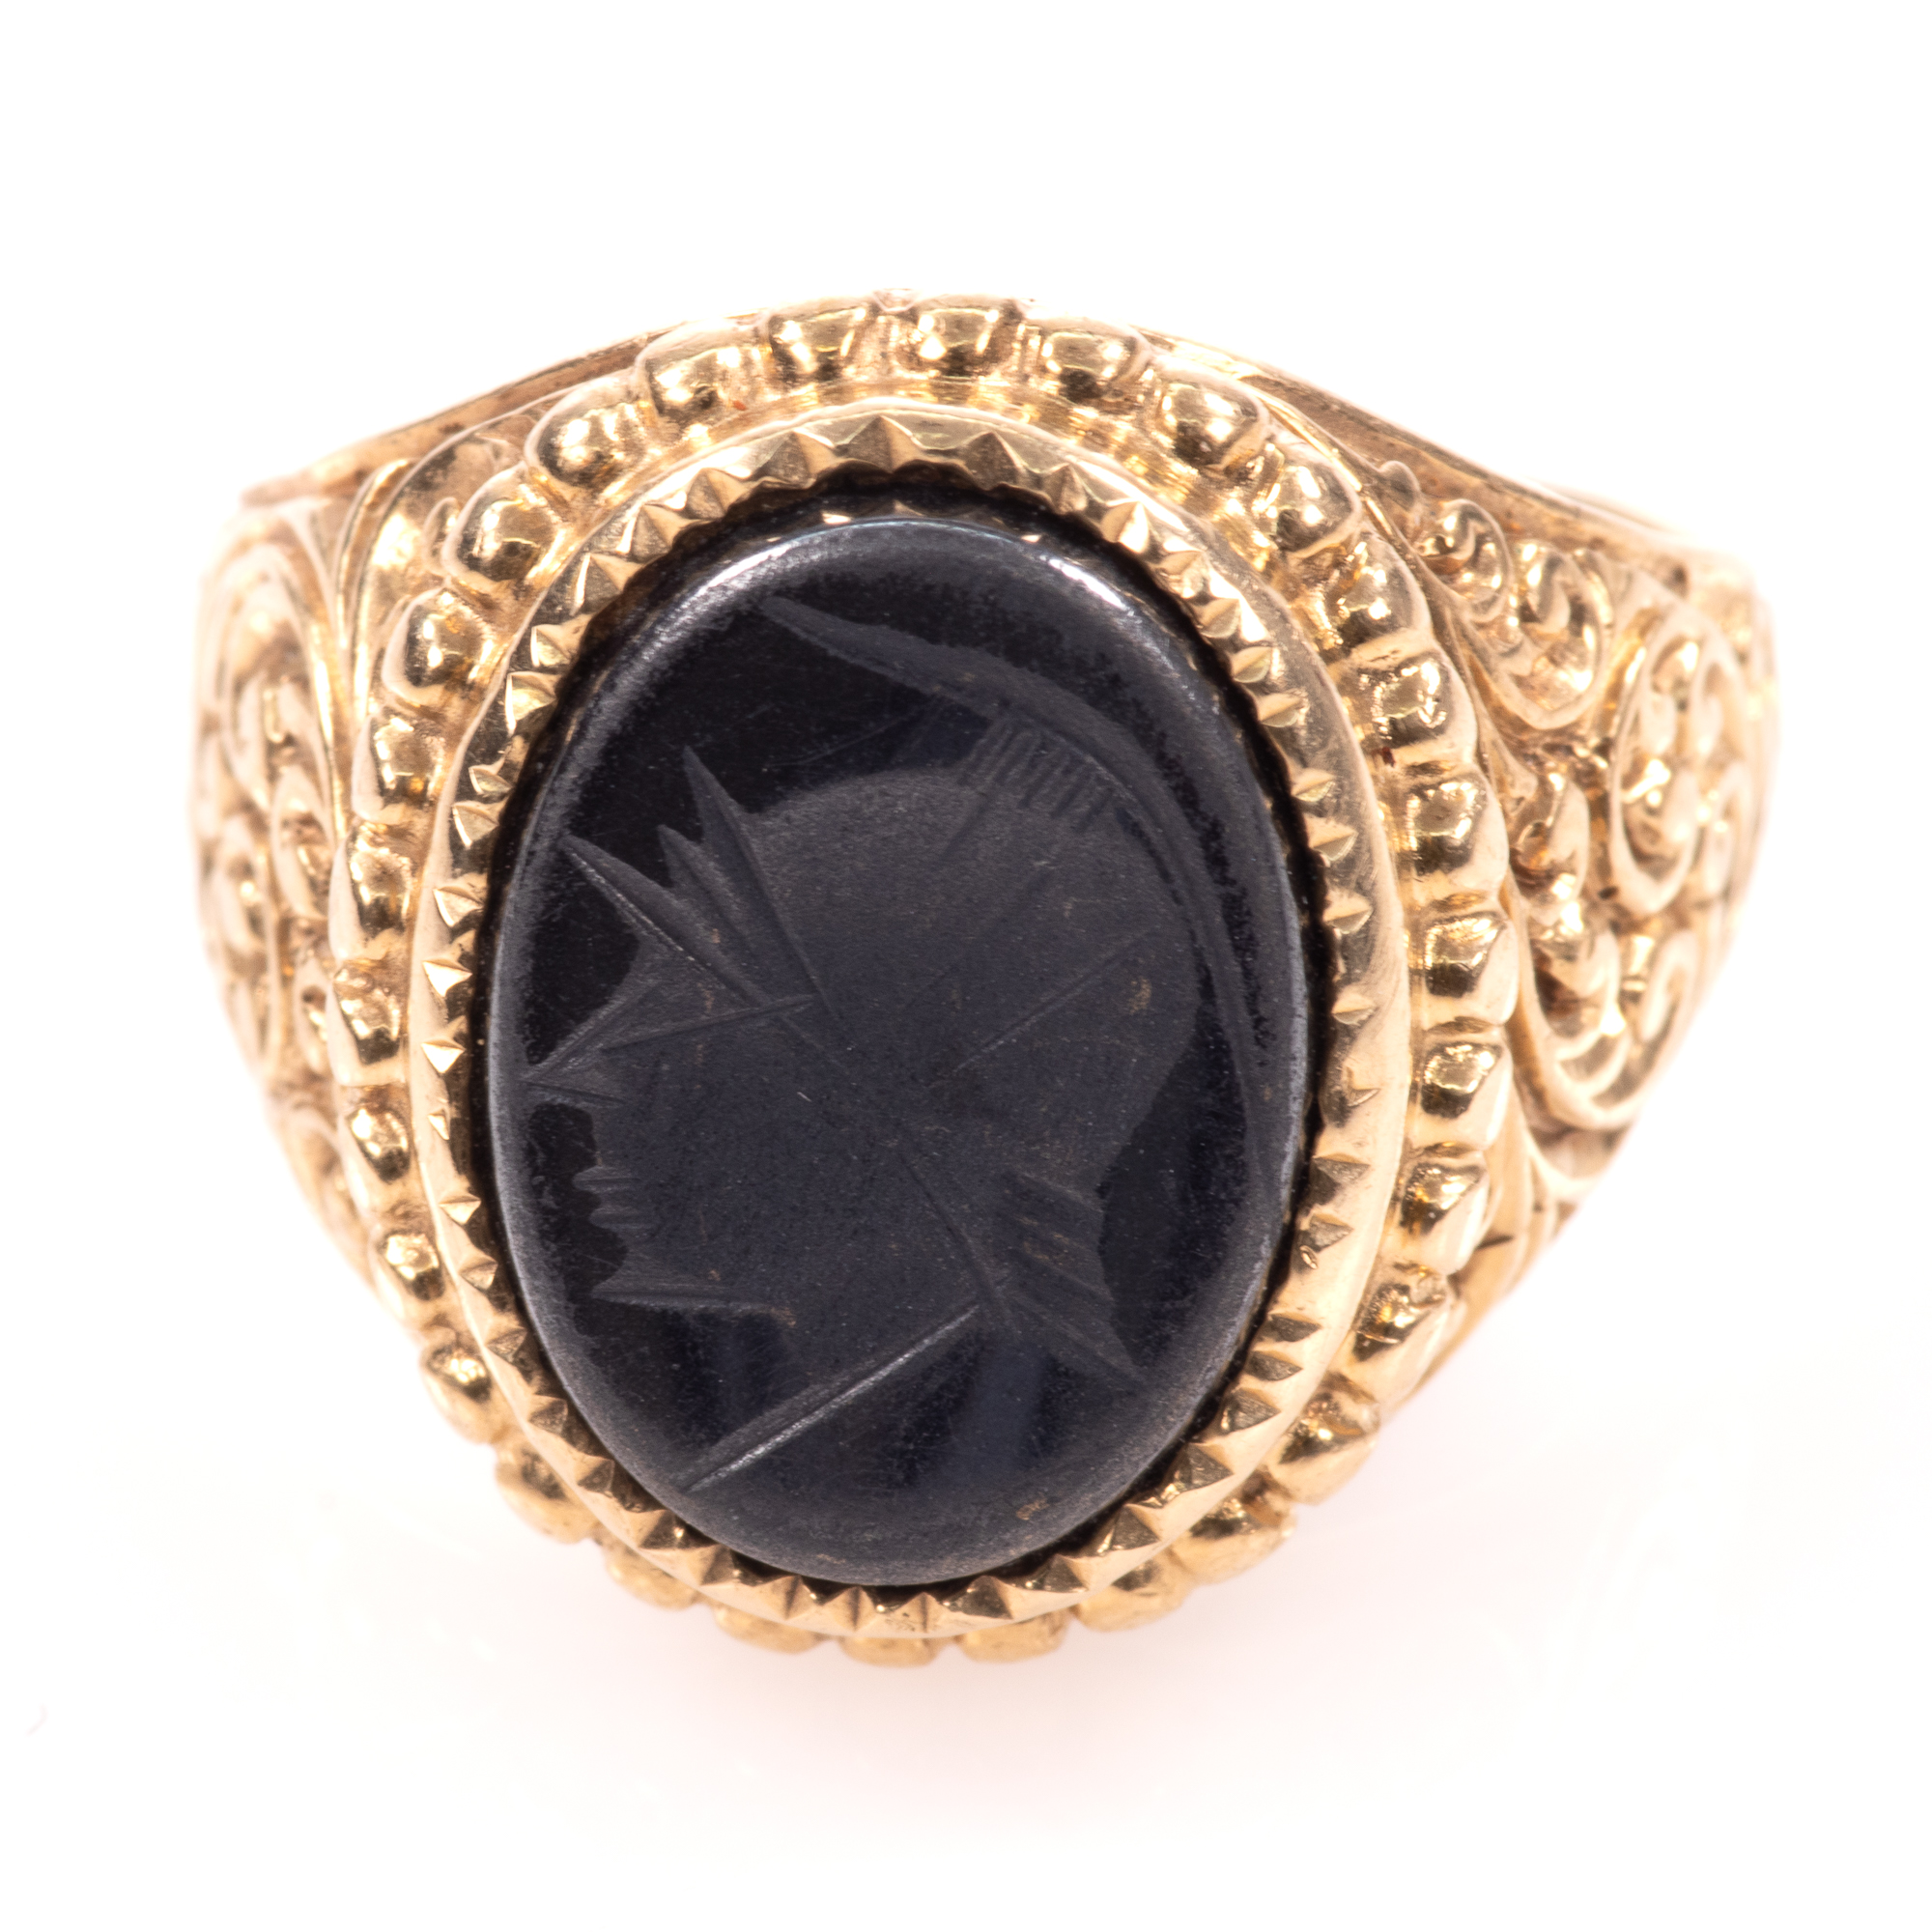 9ct Gold Centurion Onyx Signet Ring - Image 3 of 7